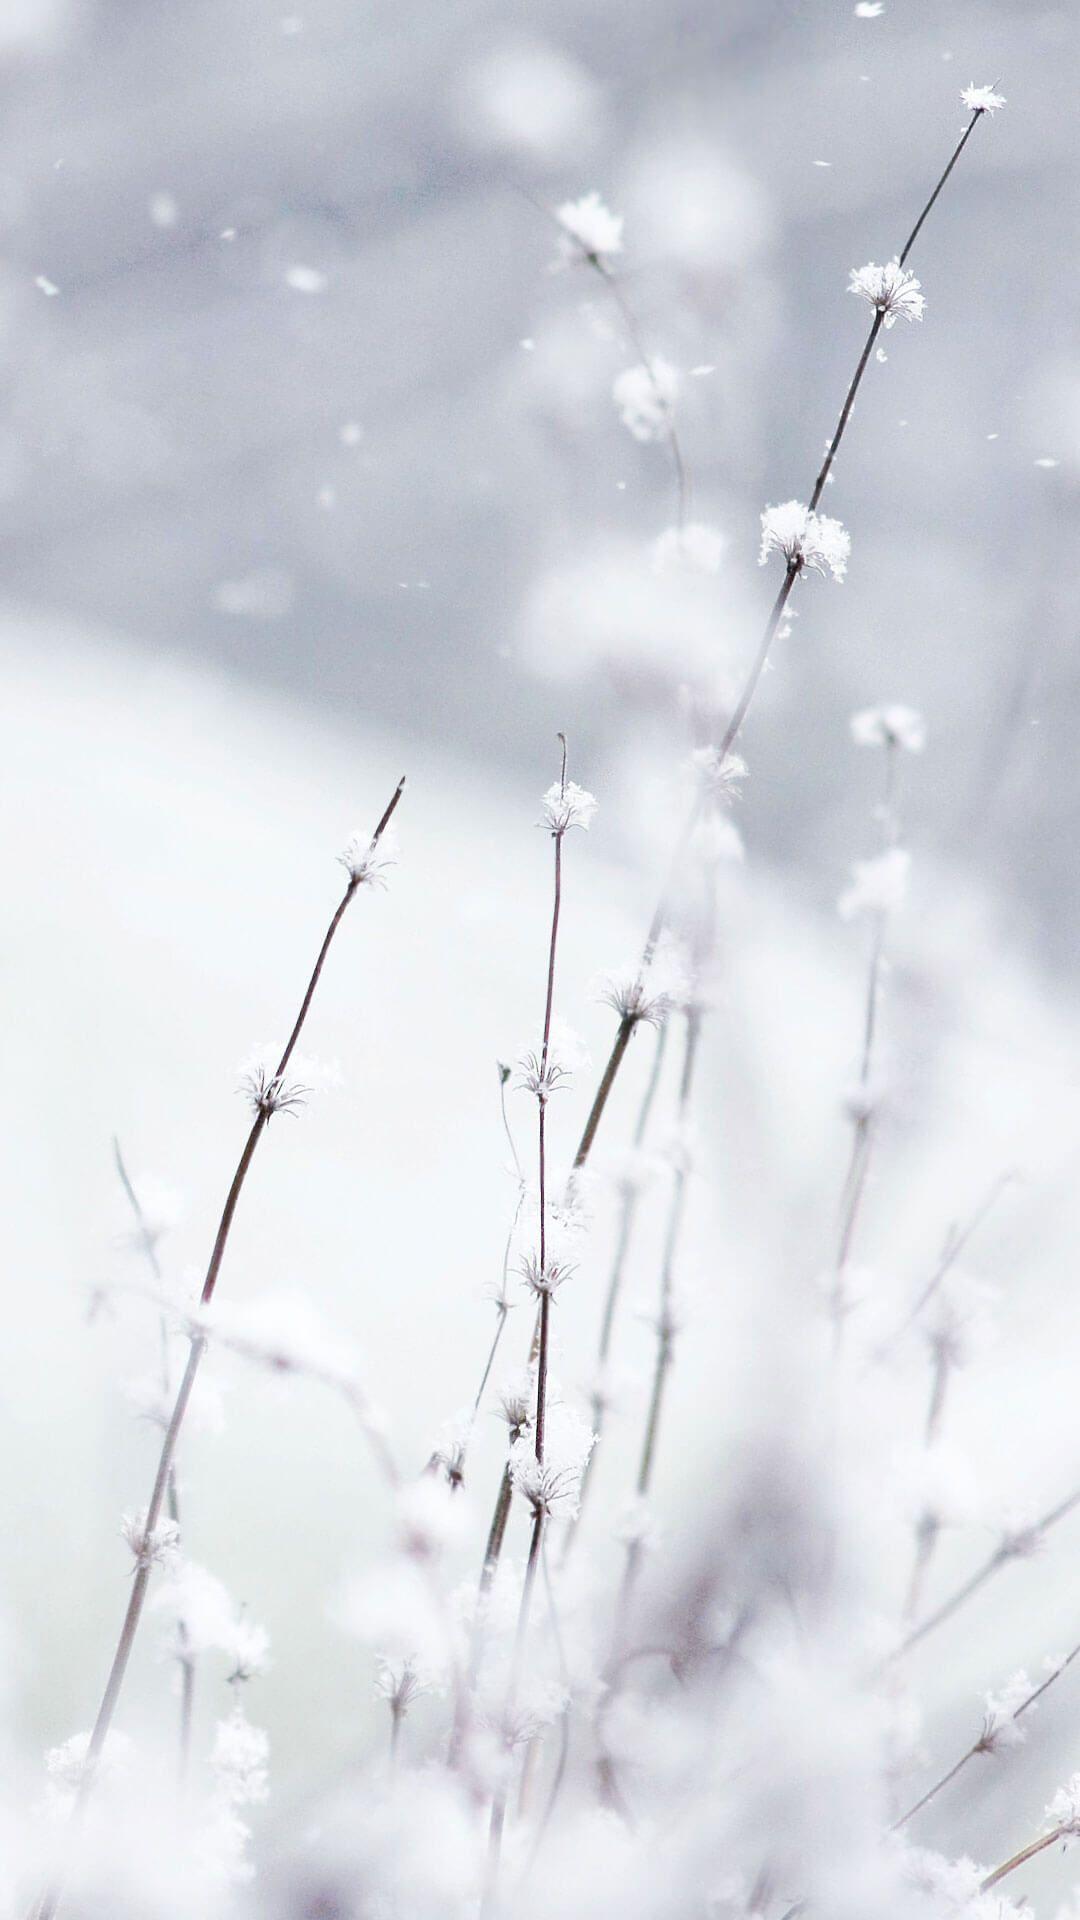 Flowers In Snow Wallpaper Iphone 6 Hd Winter Snow Wallpaper